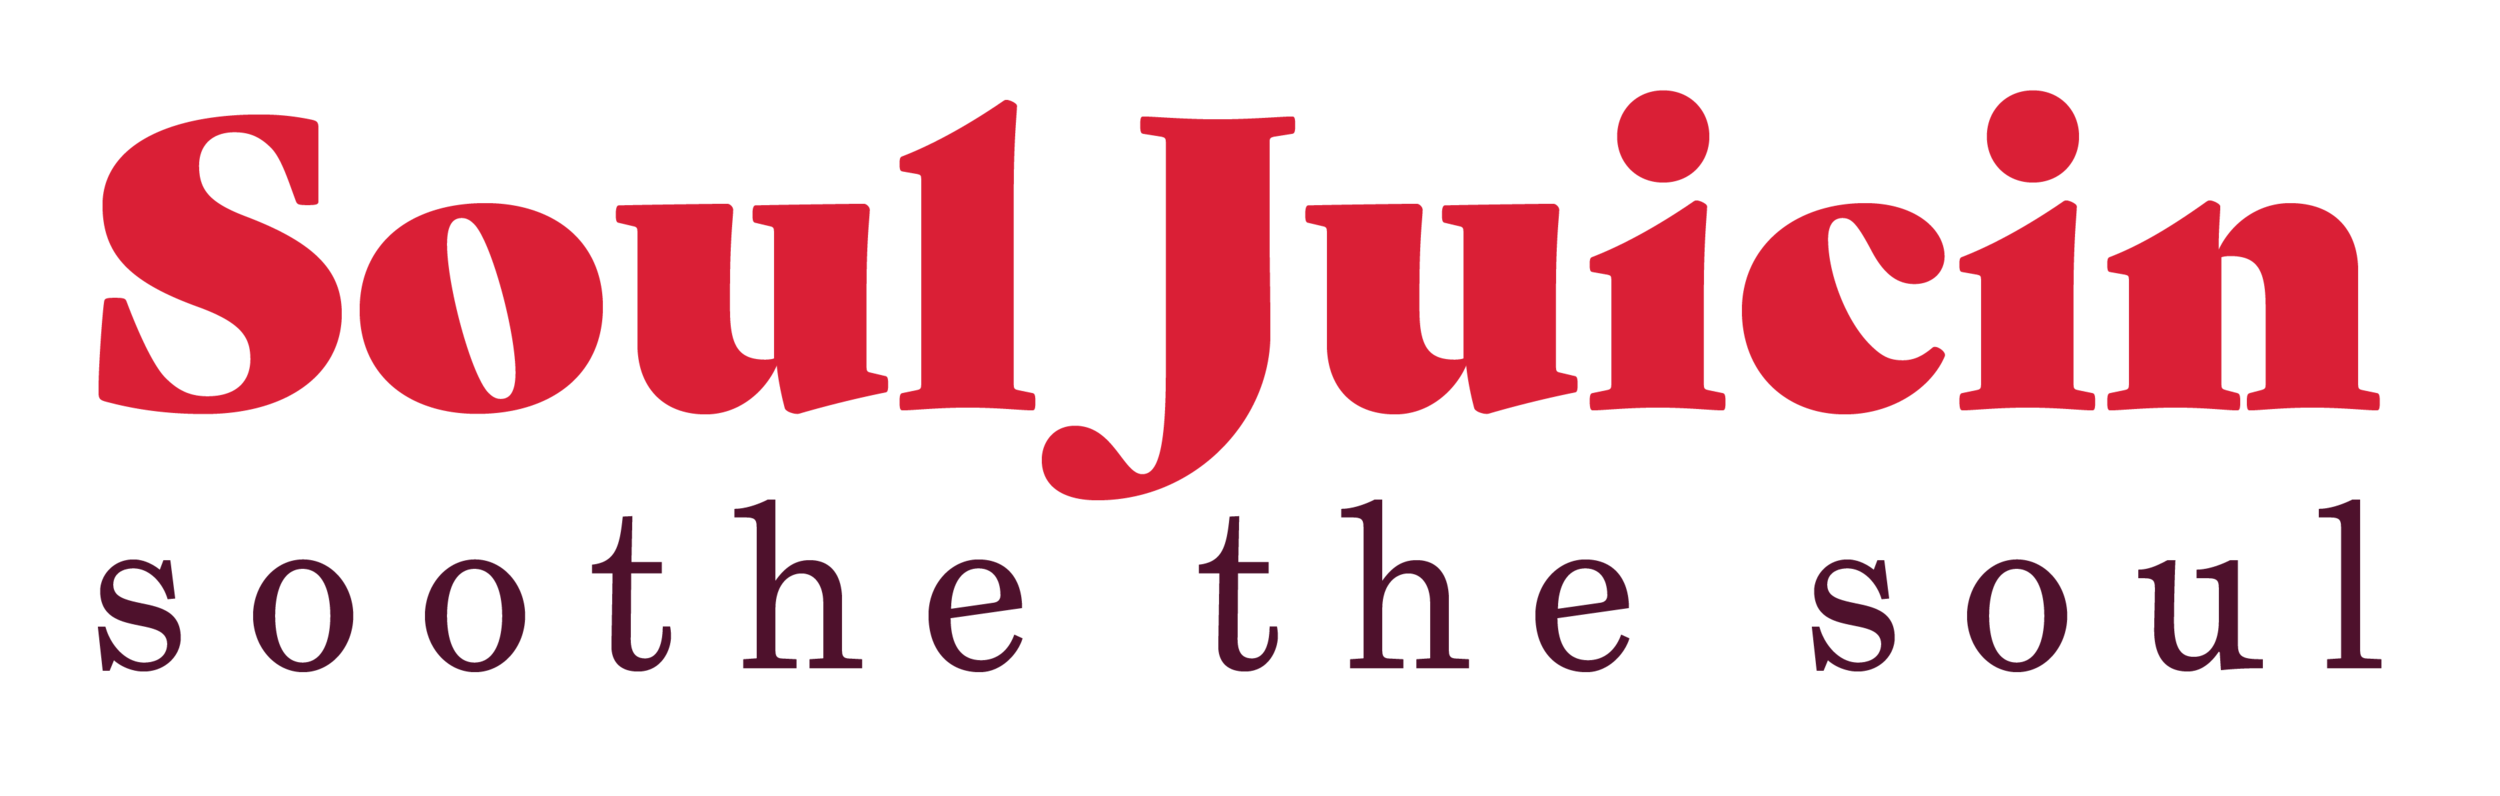 Soul Juicin logo LARGE-62.png